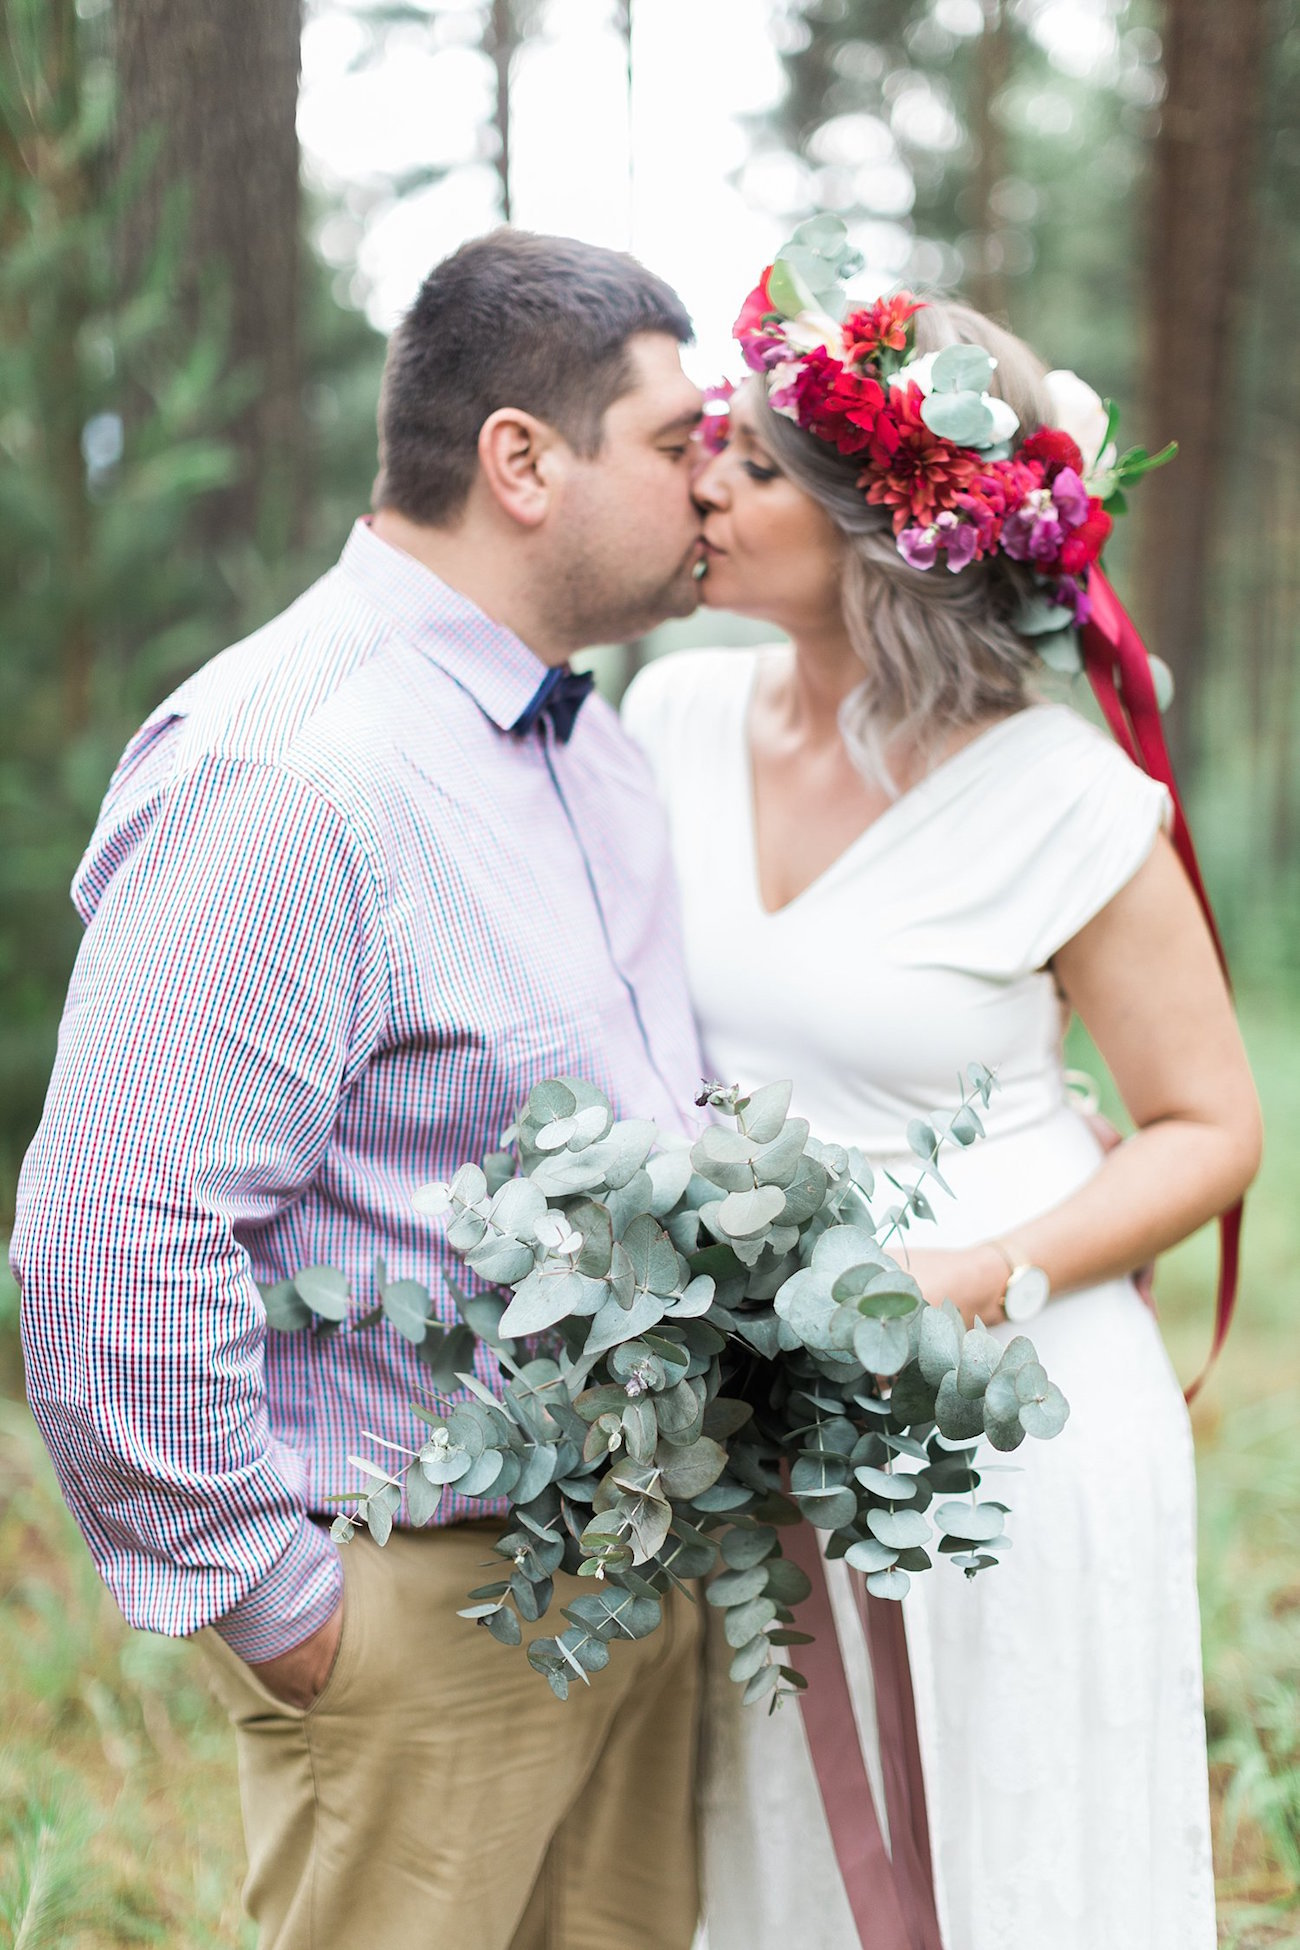 Forest Wedding Bride & Groom | Image: Alicia Landman